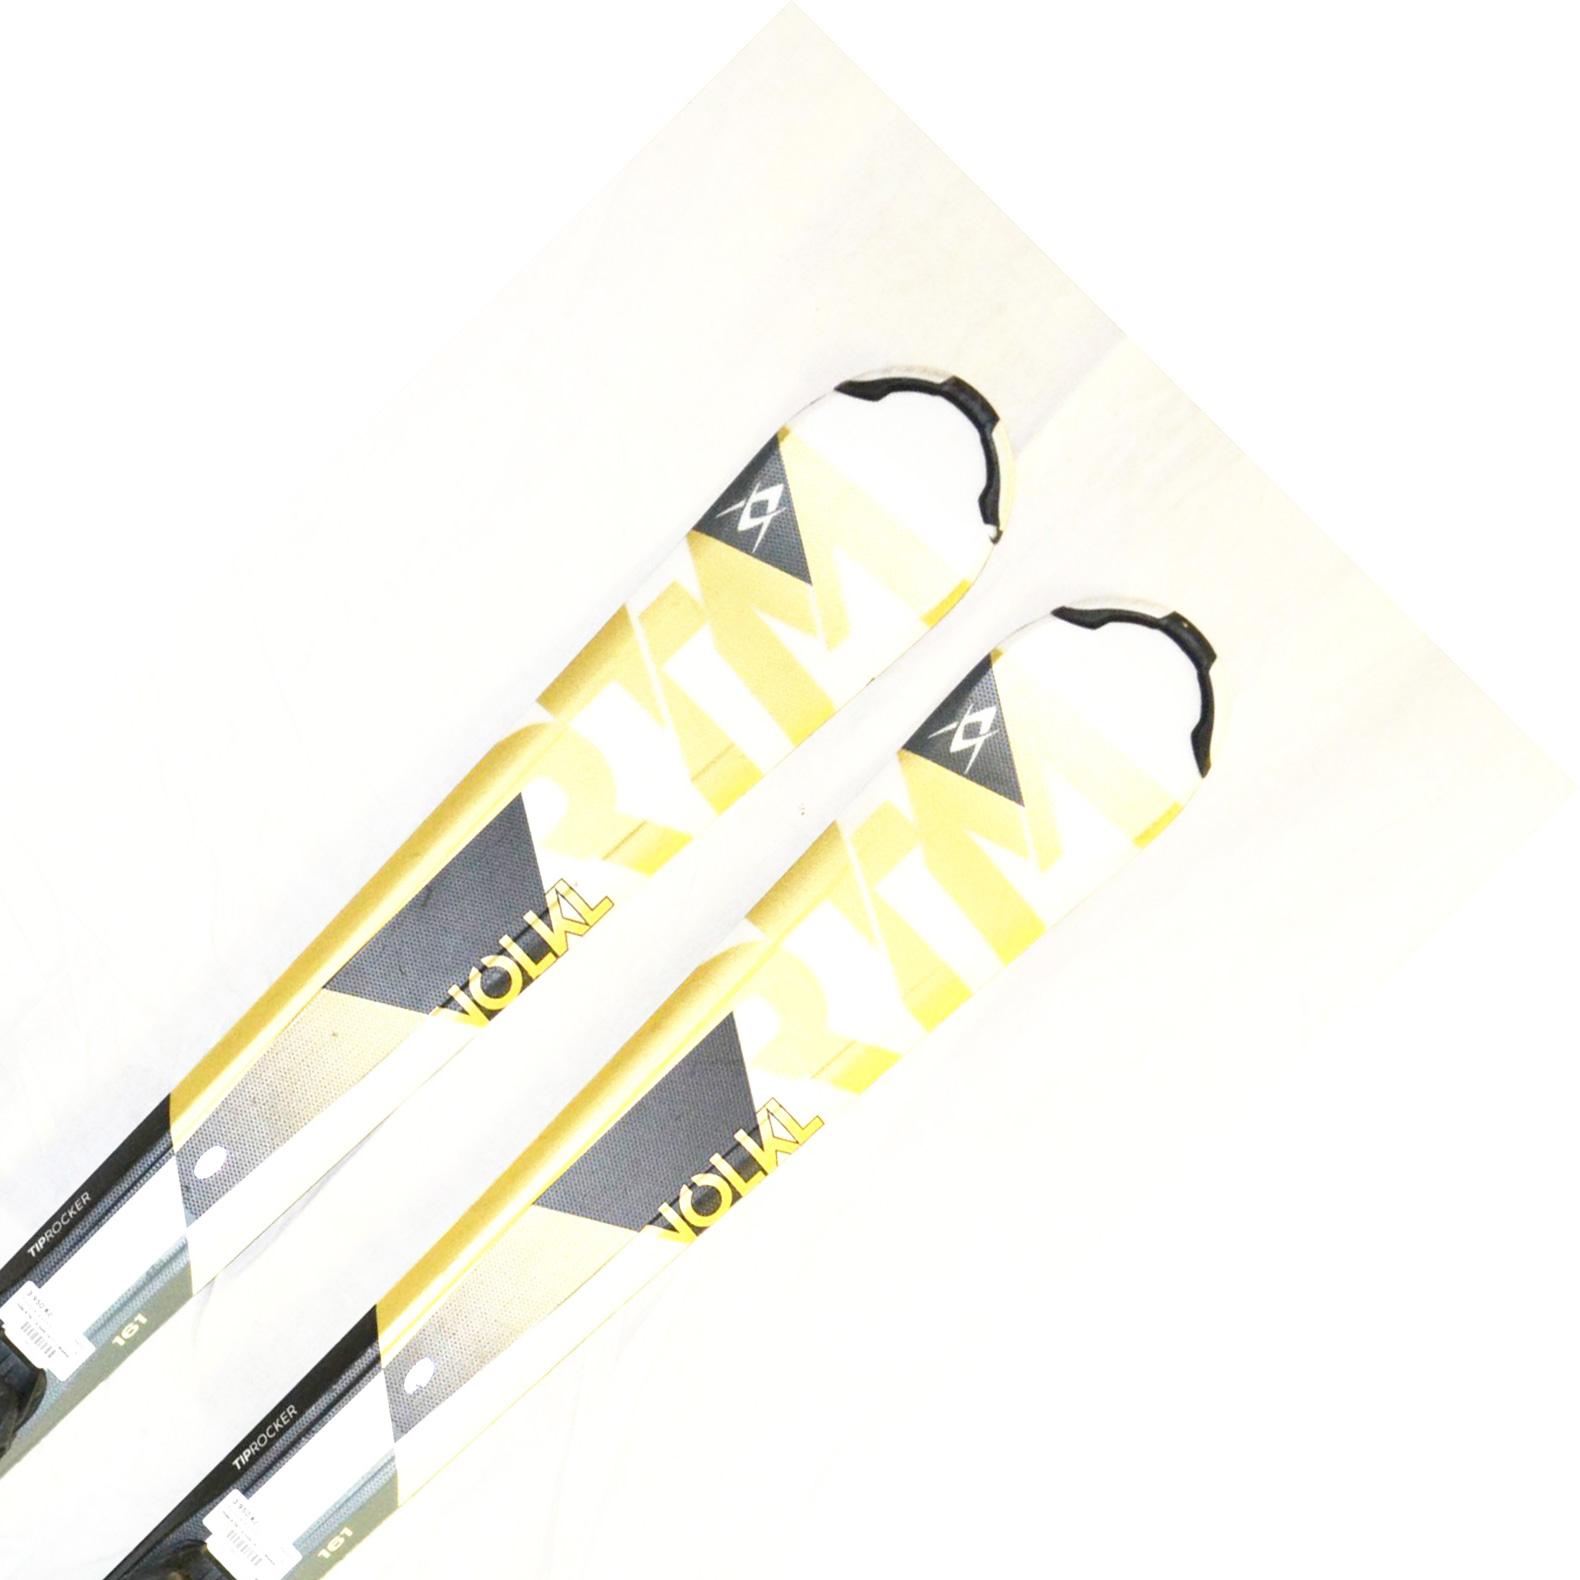 Bazar - Lyže Völkl RTM 7.6 Gold 16/17 + Marker Fastrek 10.0 - délka 161 161